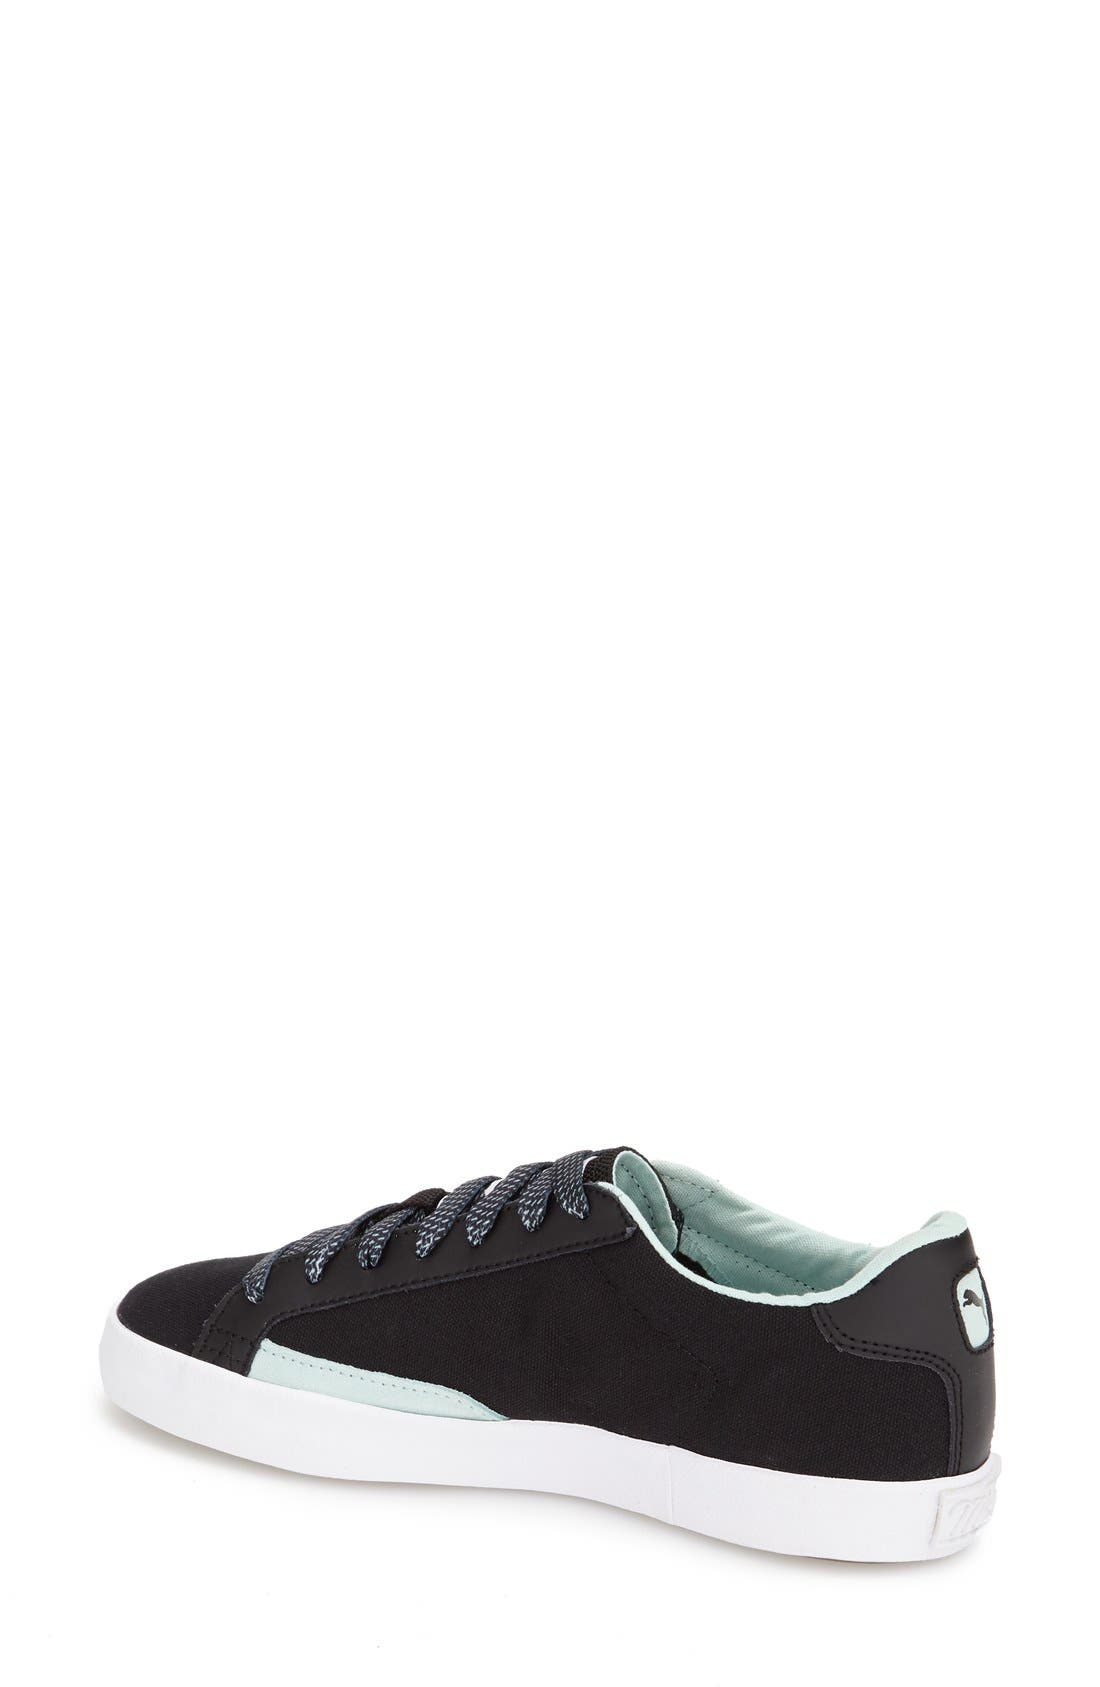 Alternate Image 2  - PUMA 'Match Vulc' Sneaker (Women)